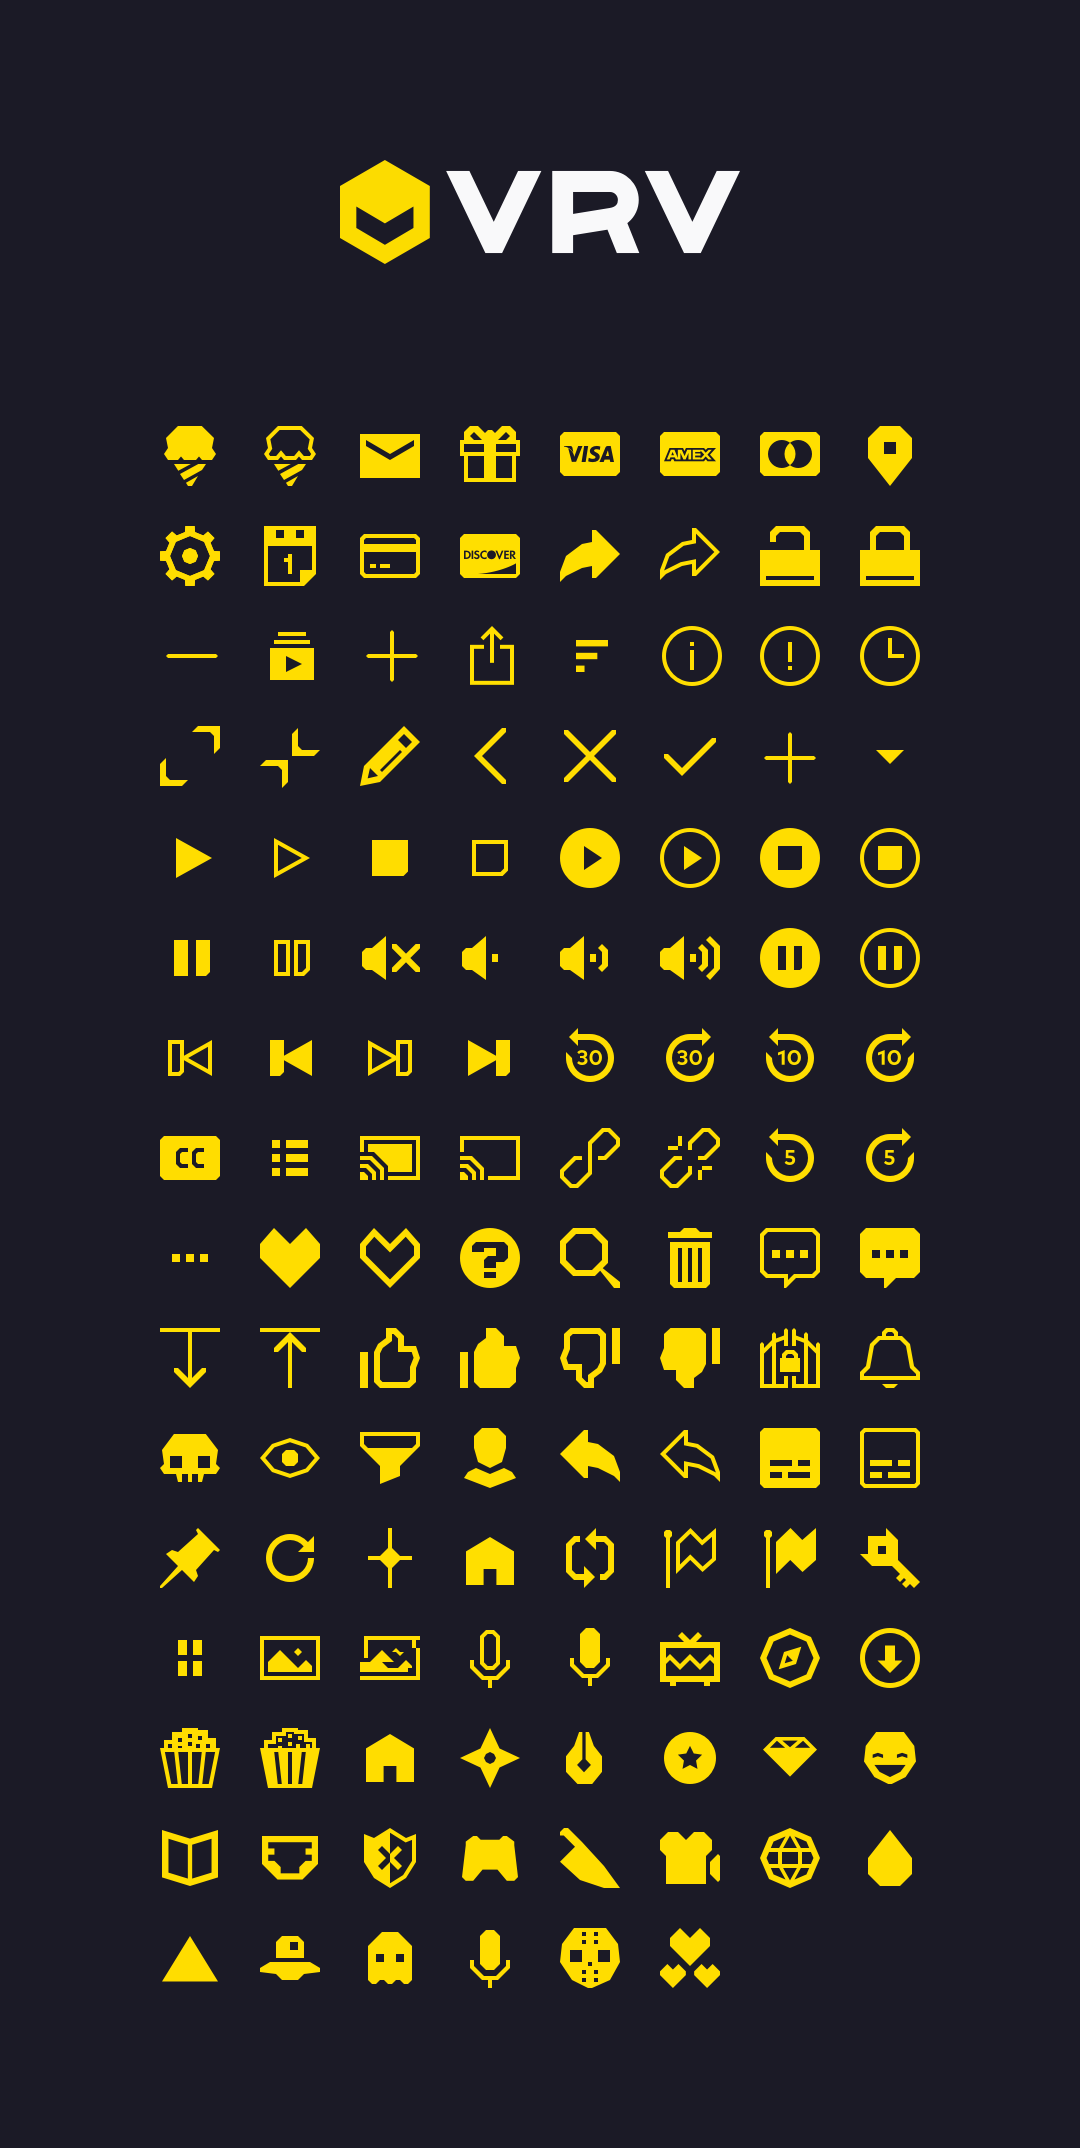 vrv-icons-wip@2x.png